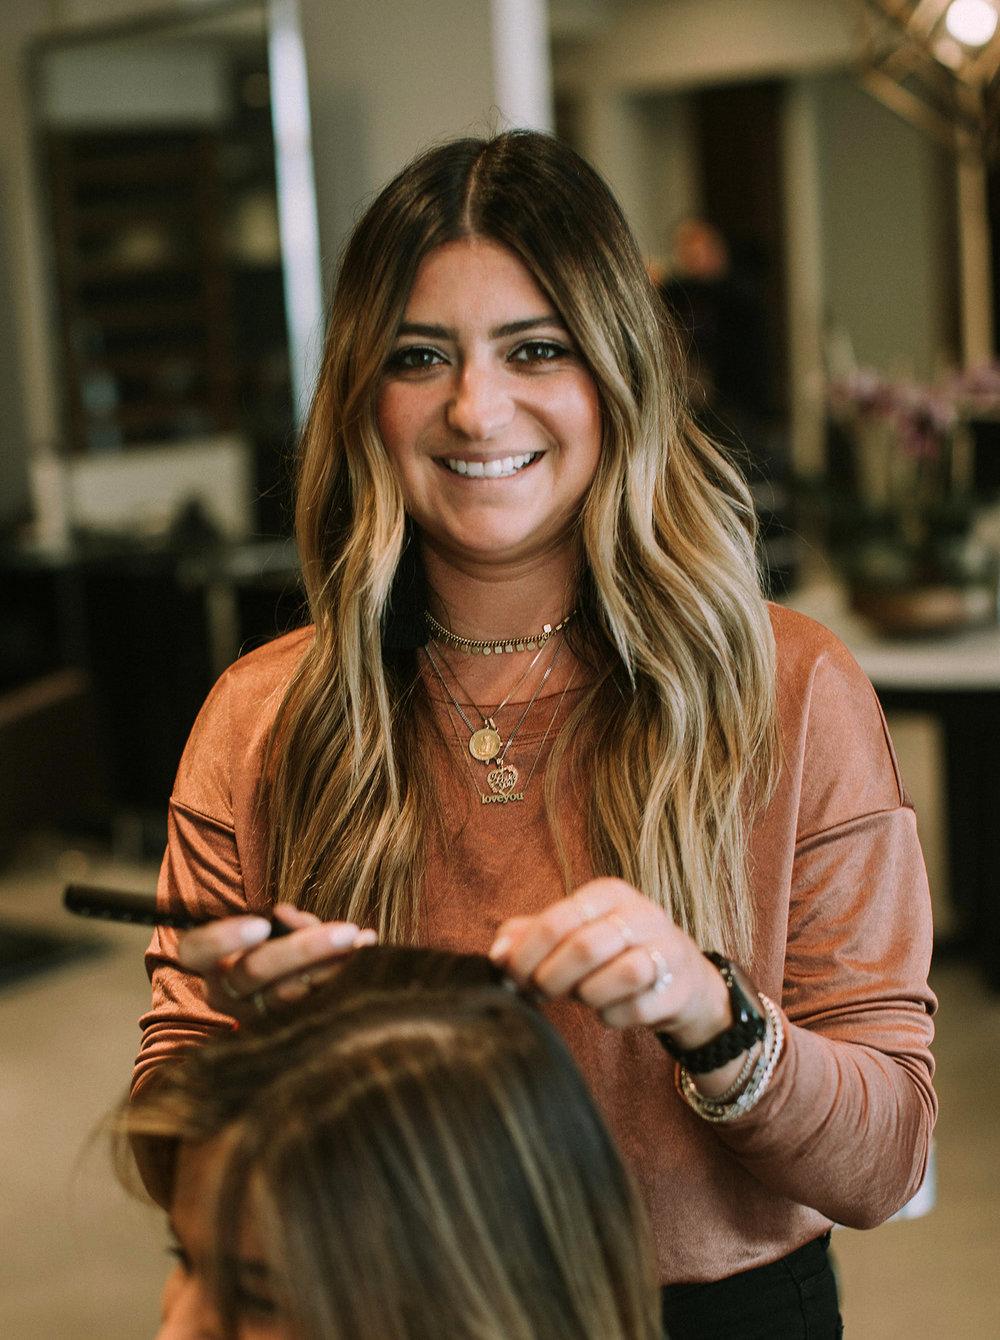 Natalie Salvo / Hair colorist